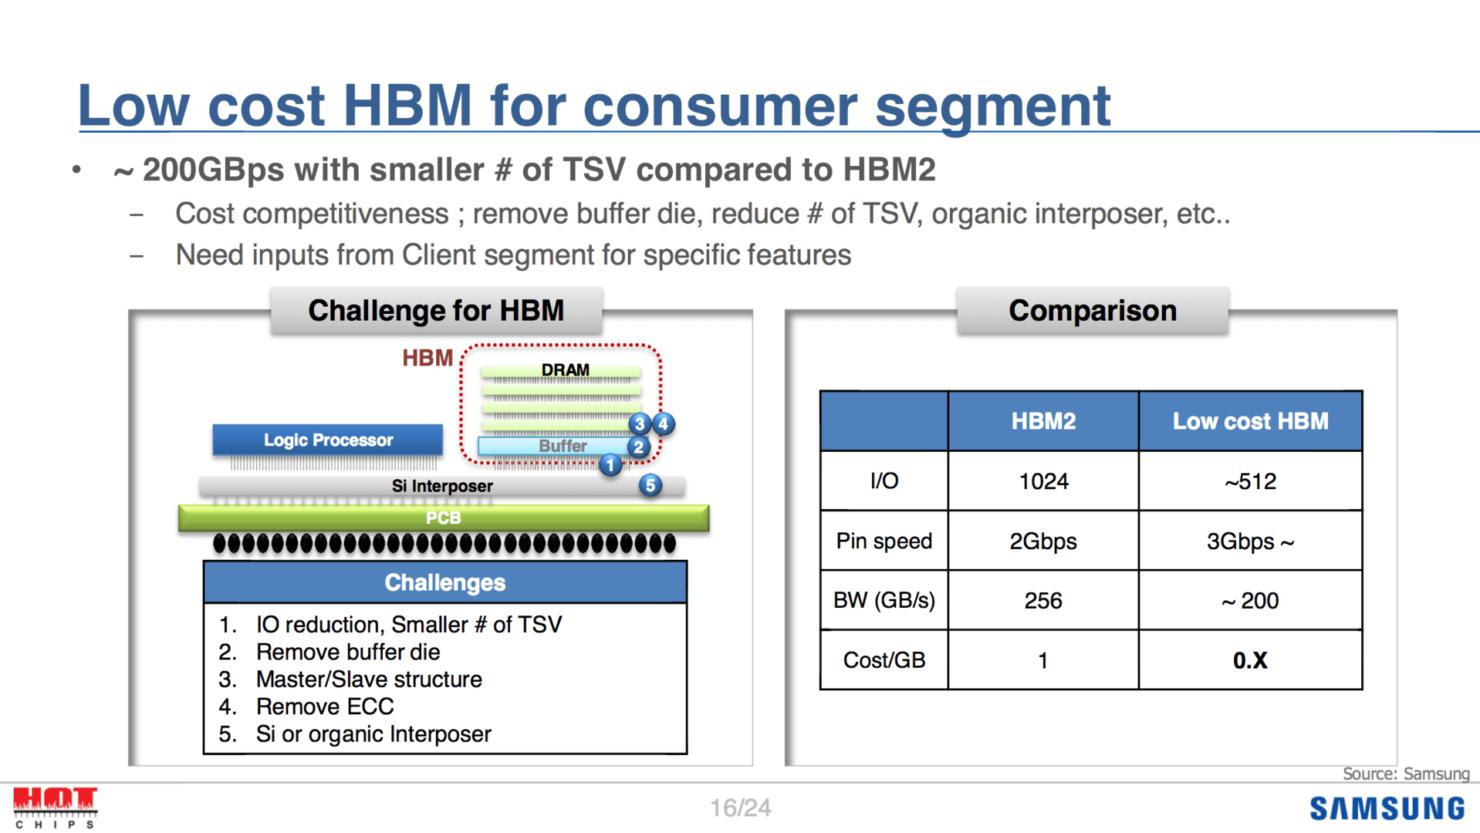 samsung-low-cost-hbm